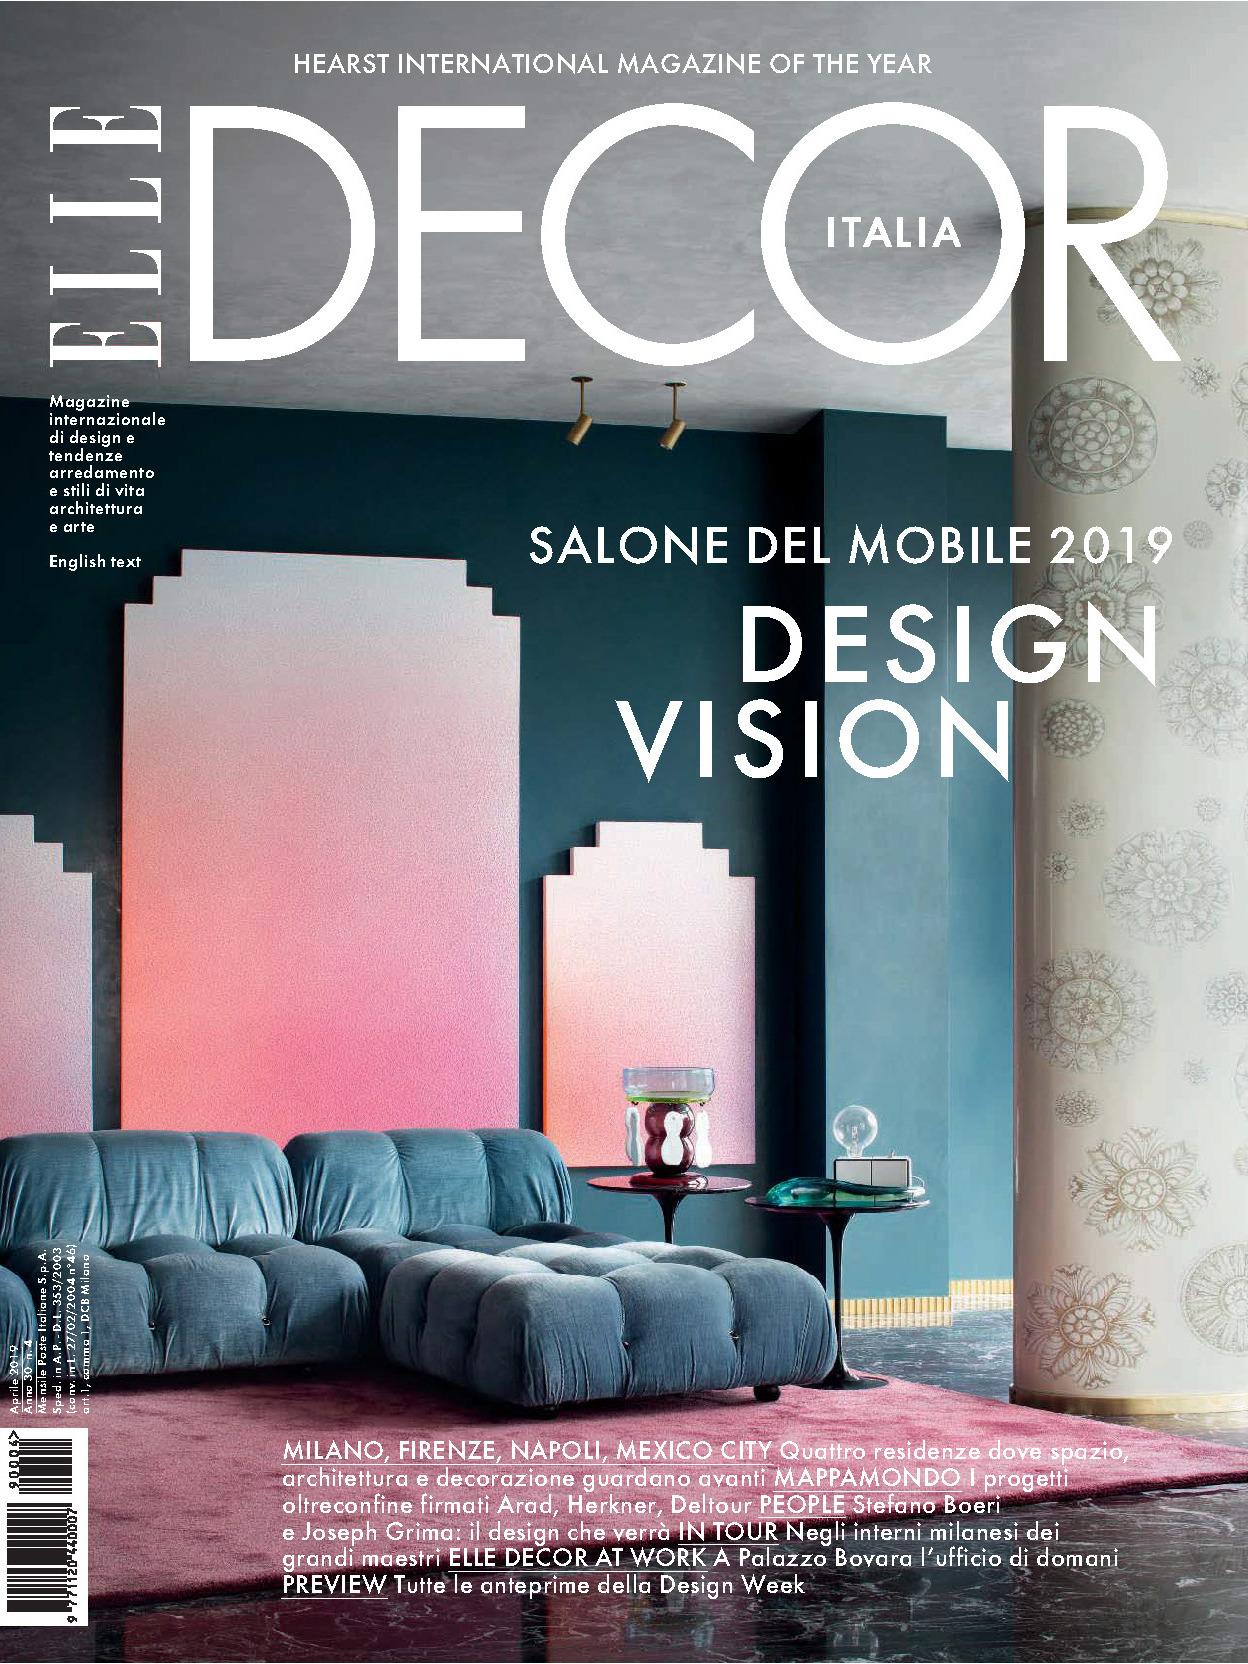 《Elle Decor》意大利版时尚家居杂志2019年04月号